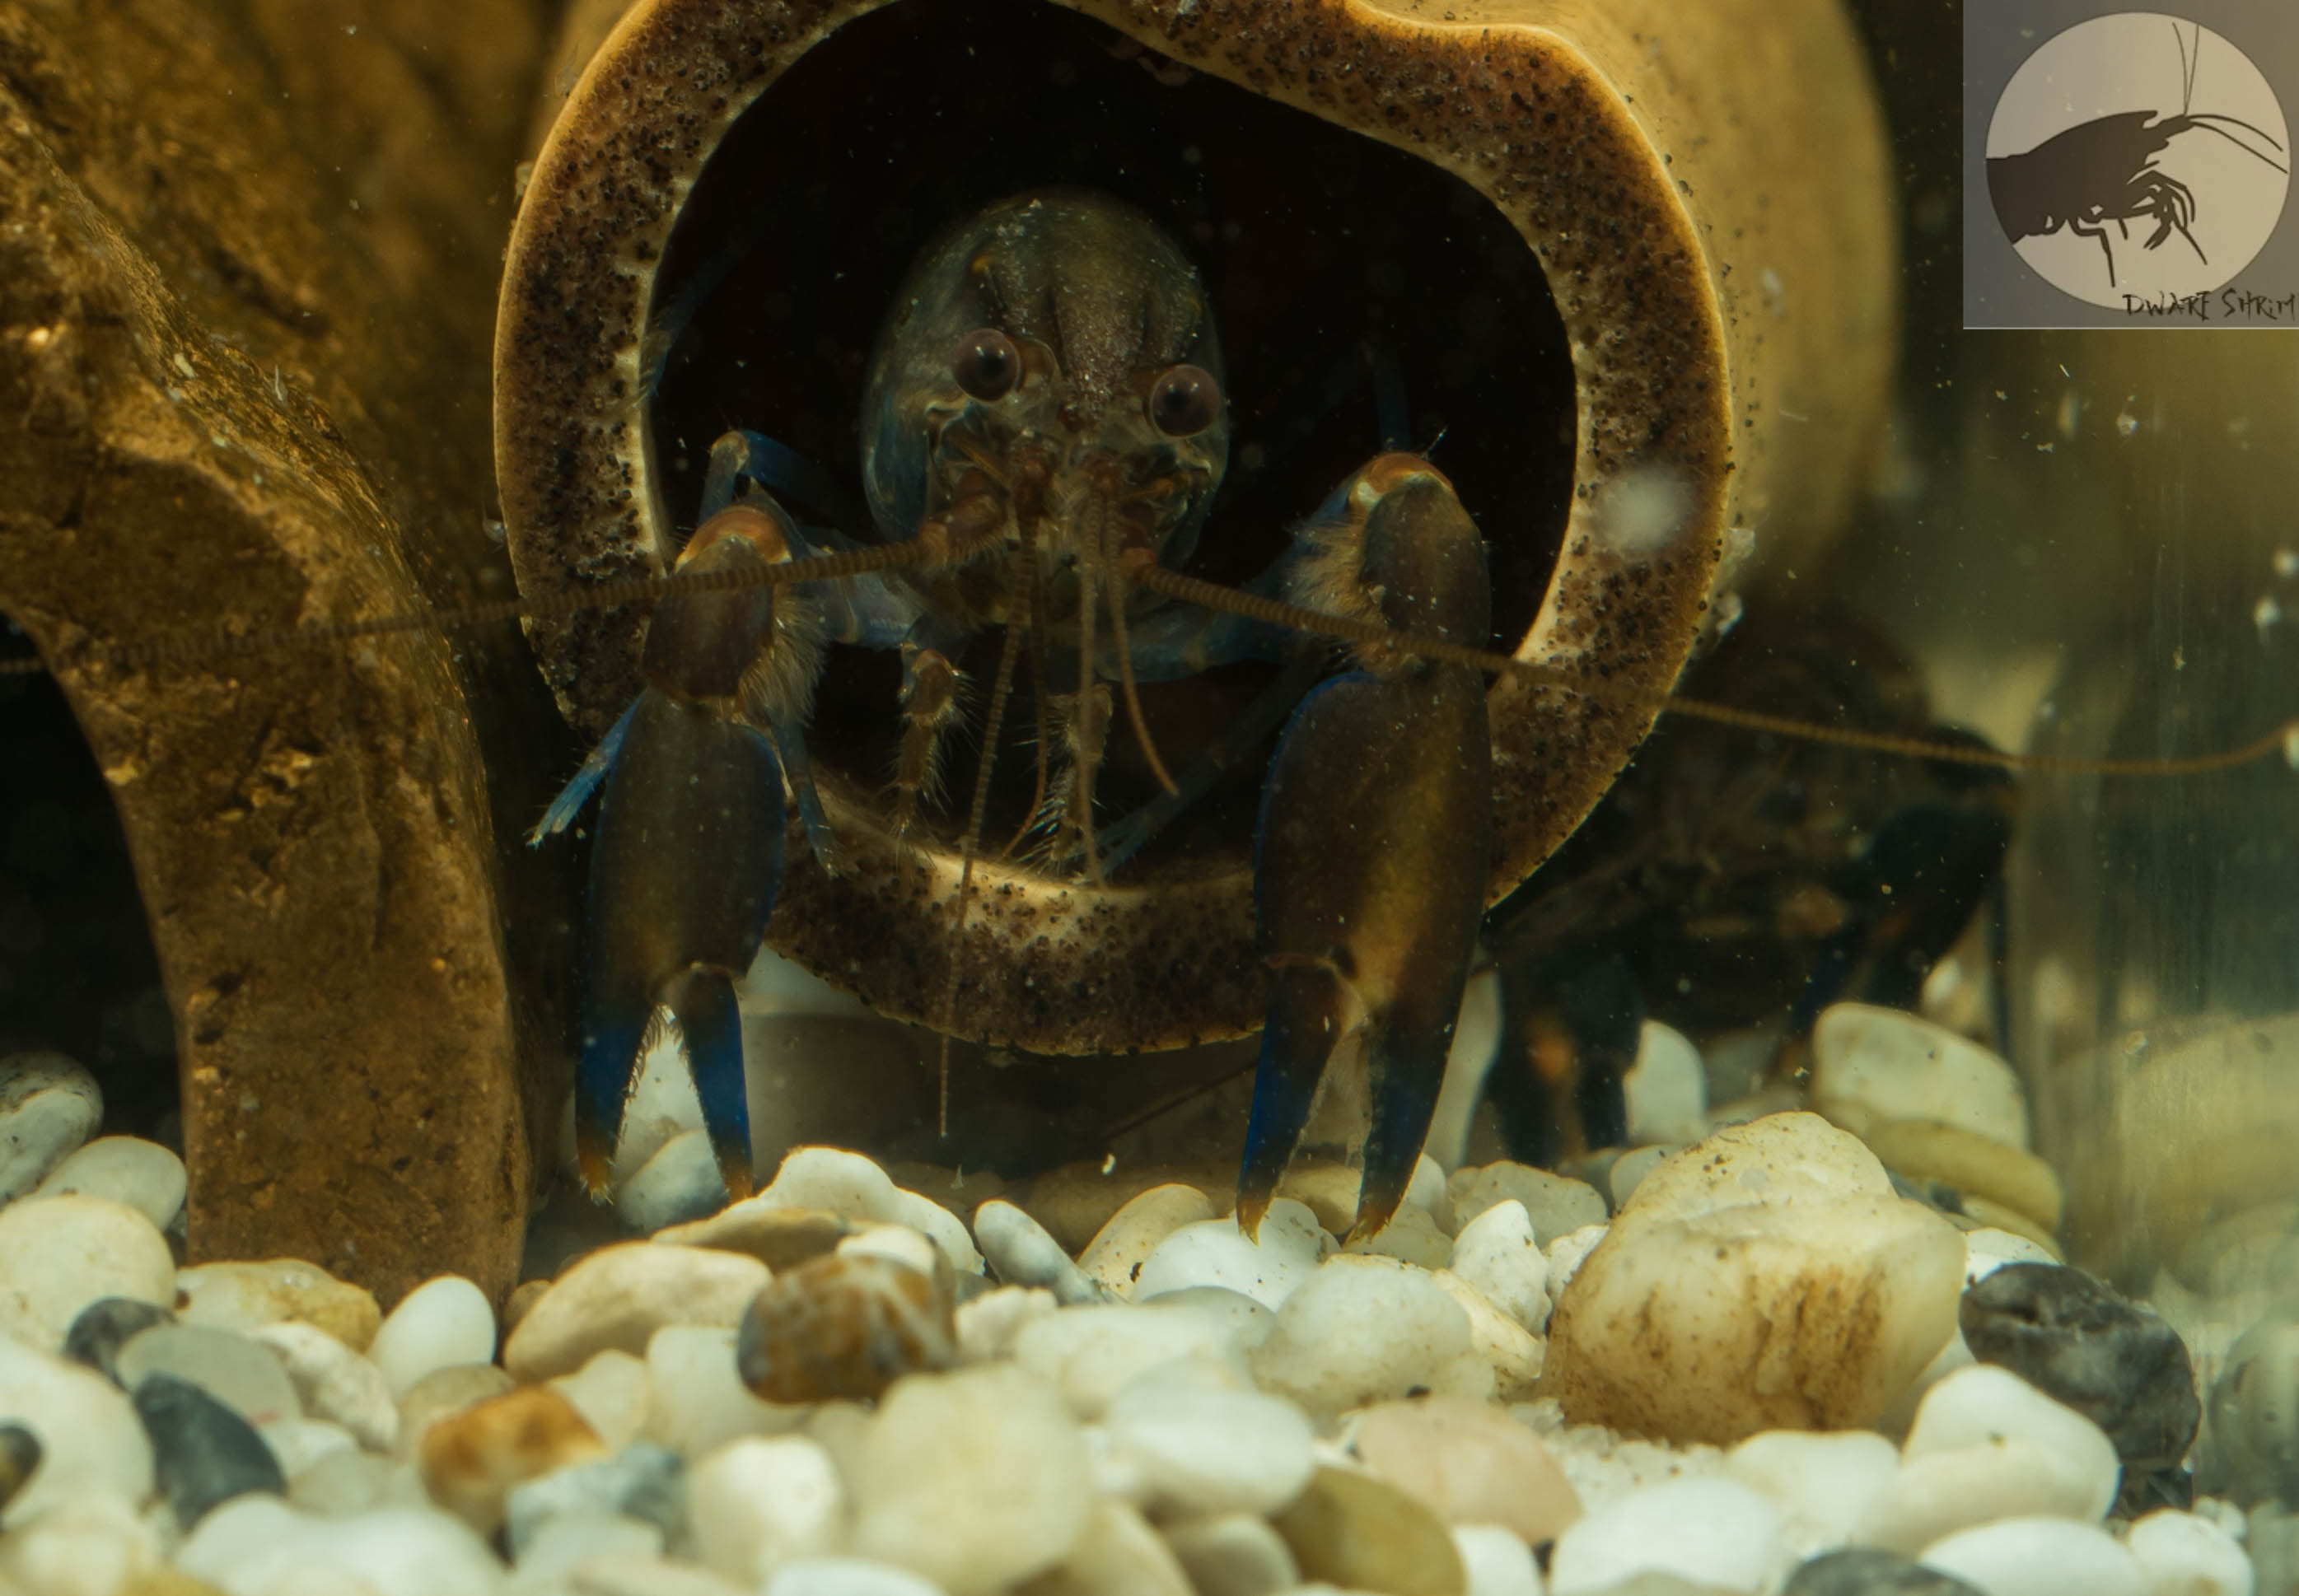 Krebshohle Fur Aquarien Flusskrebse Shrimp Shop